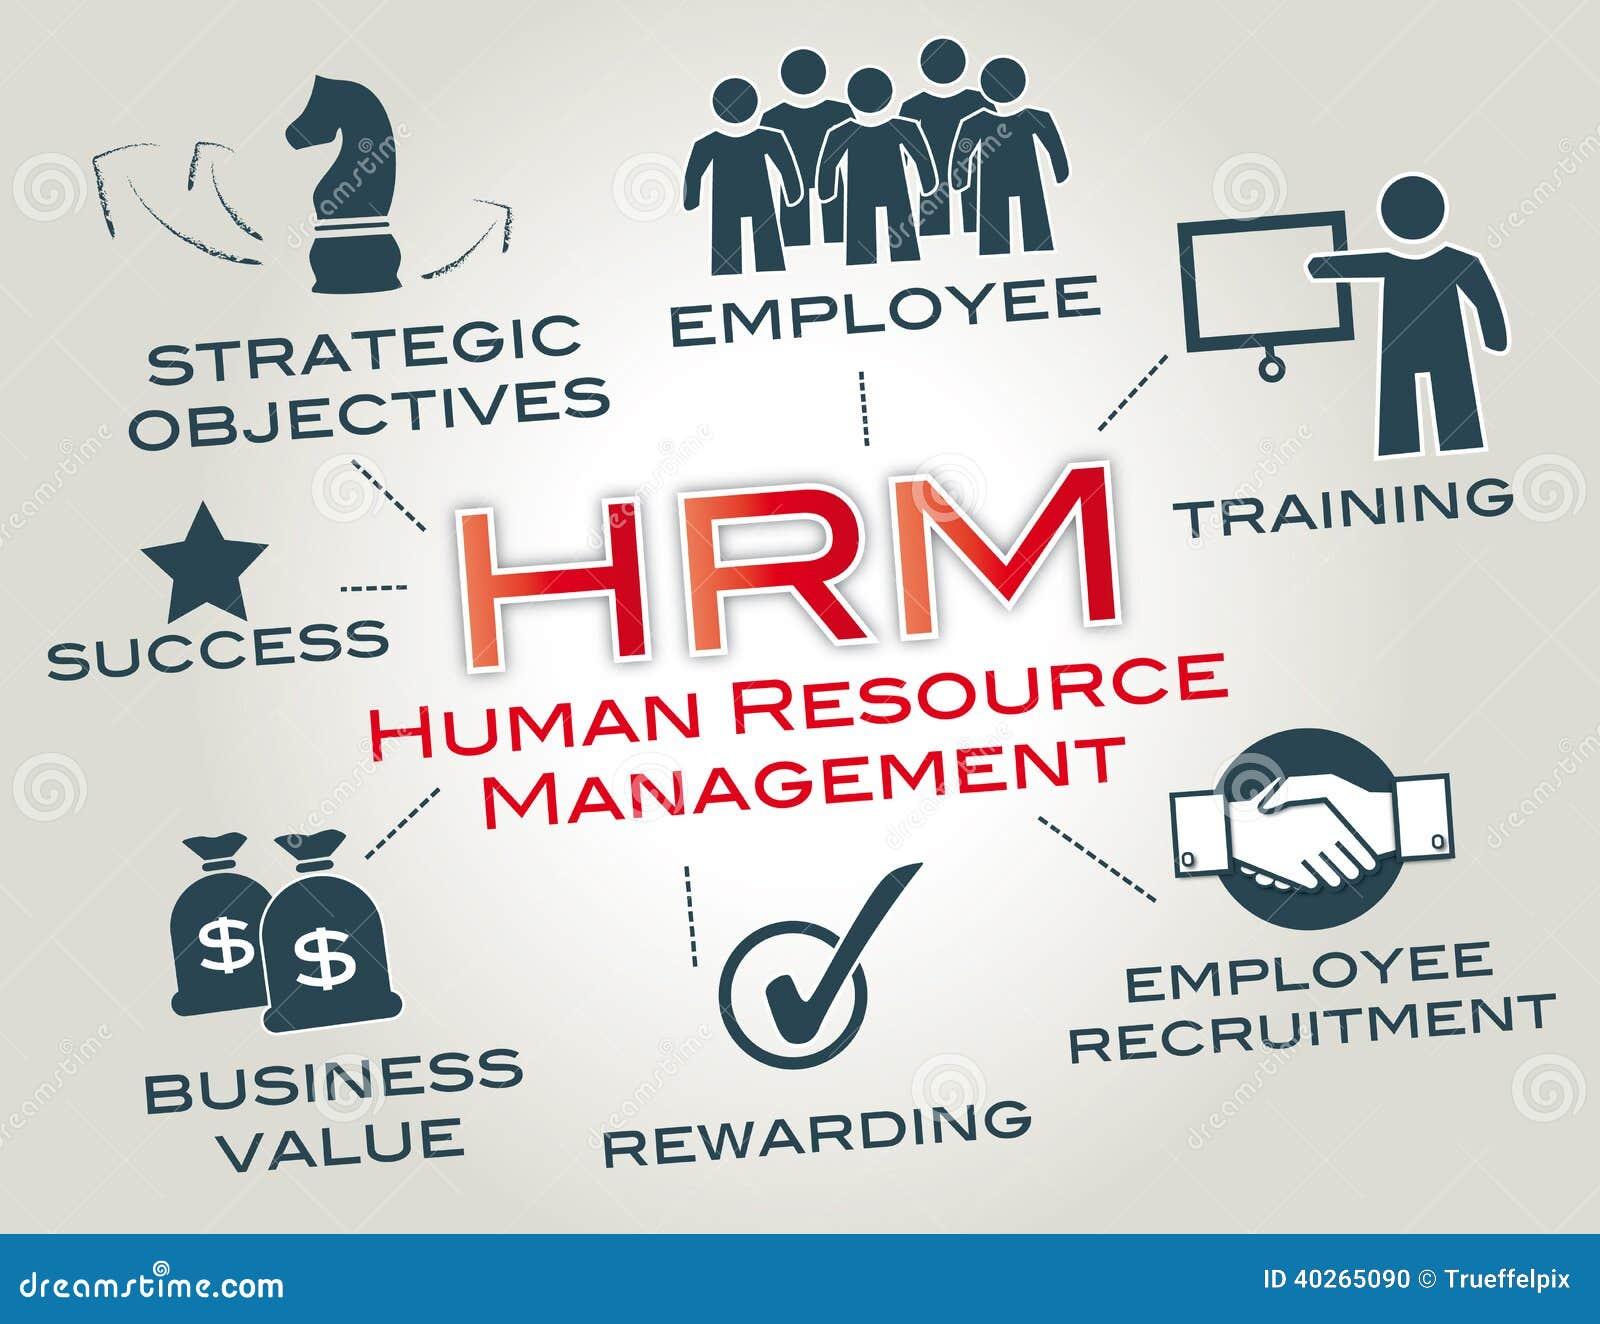 volkswagen human resource management Search human resources jobs in chattanooga, tn 223 open jobs in chattanooga for human resources average salary: $58,716.